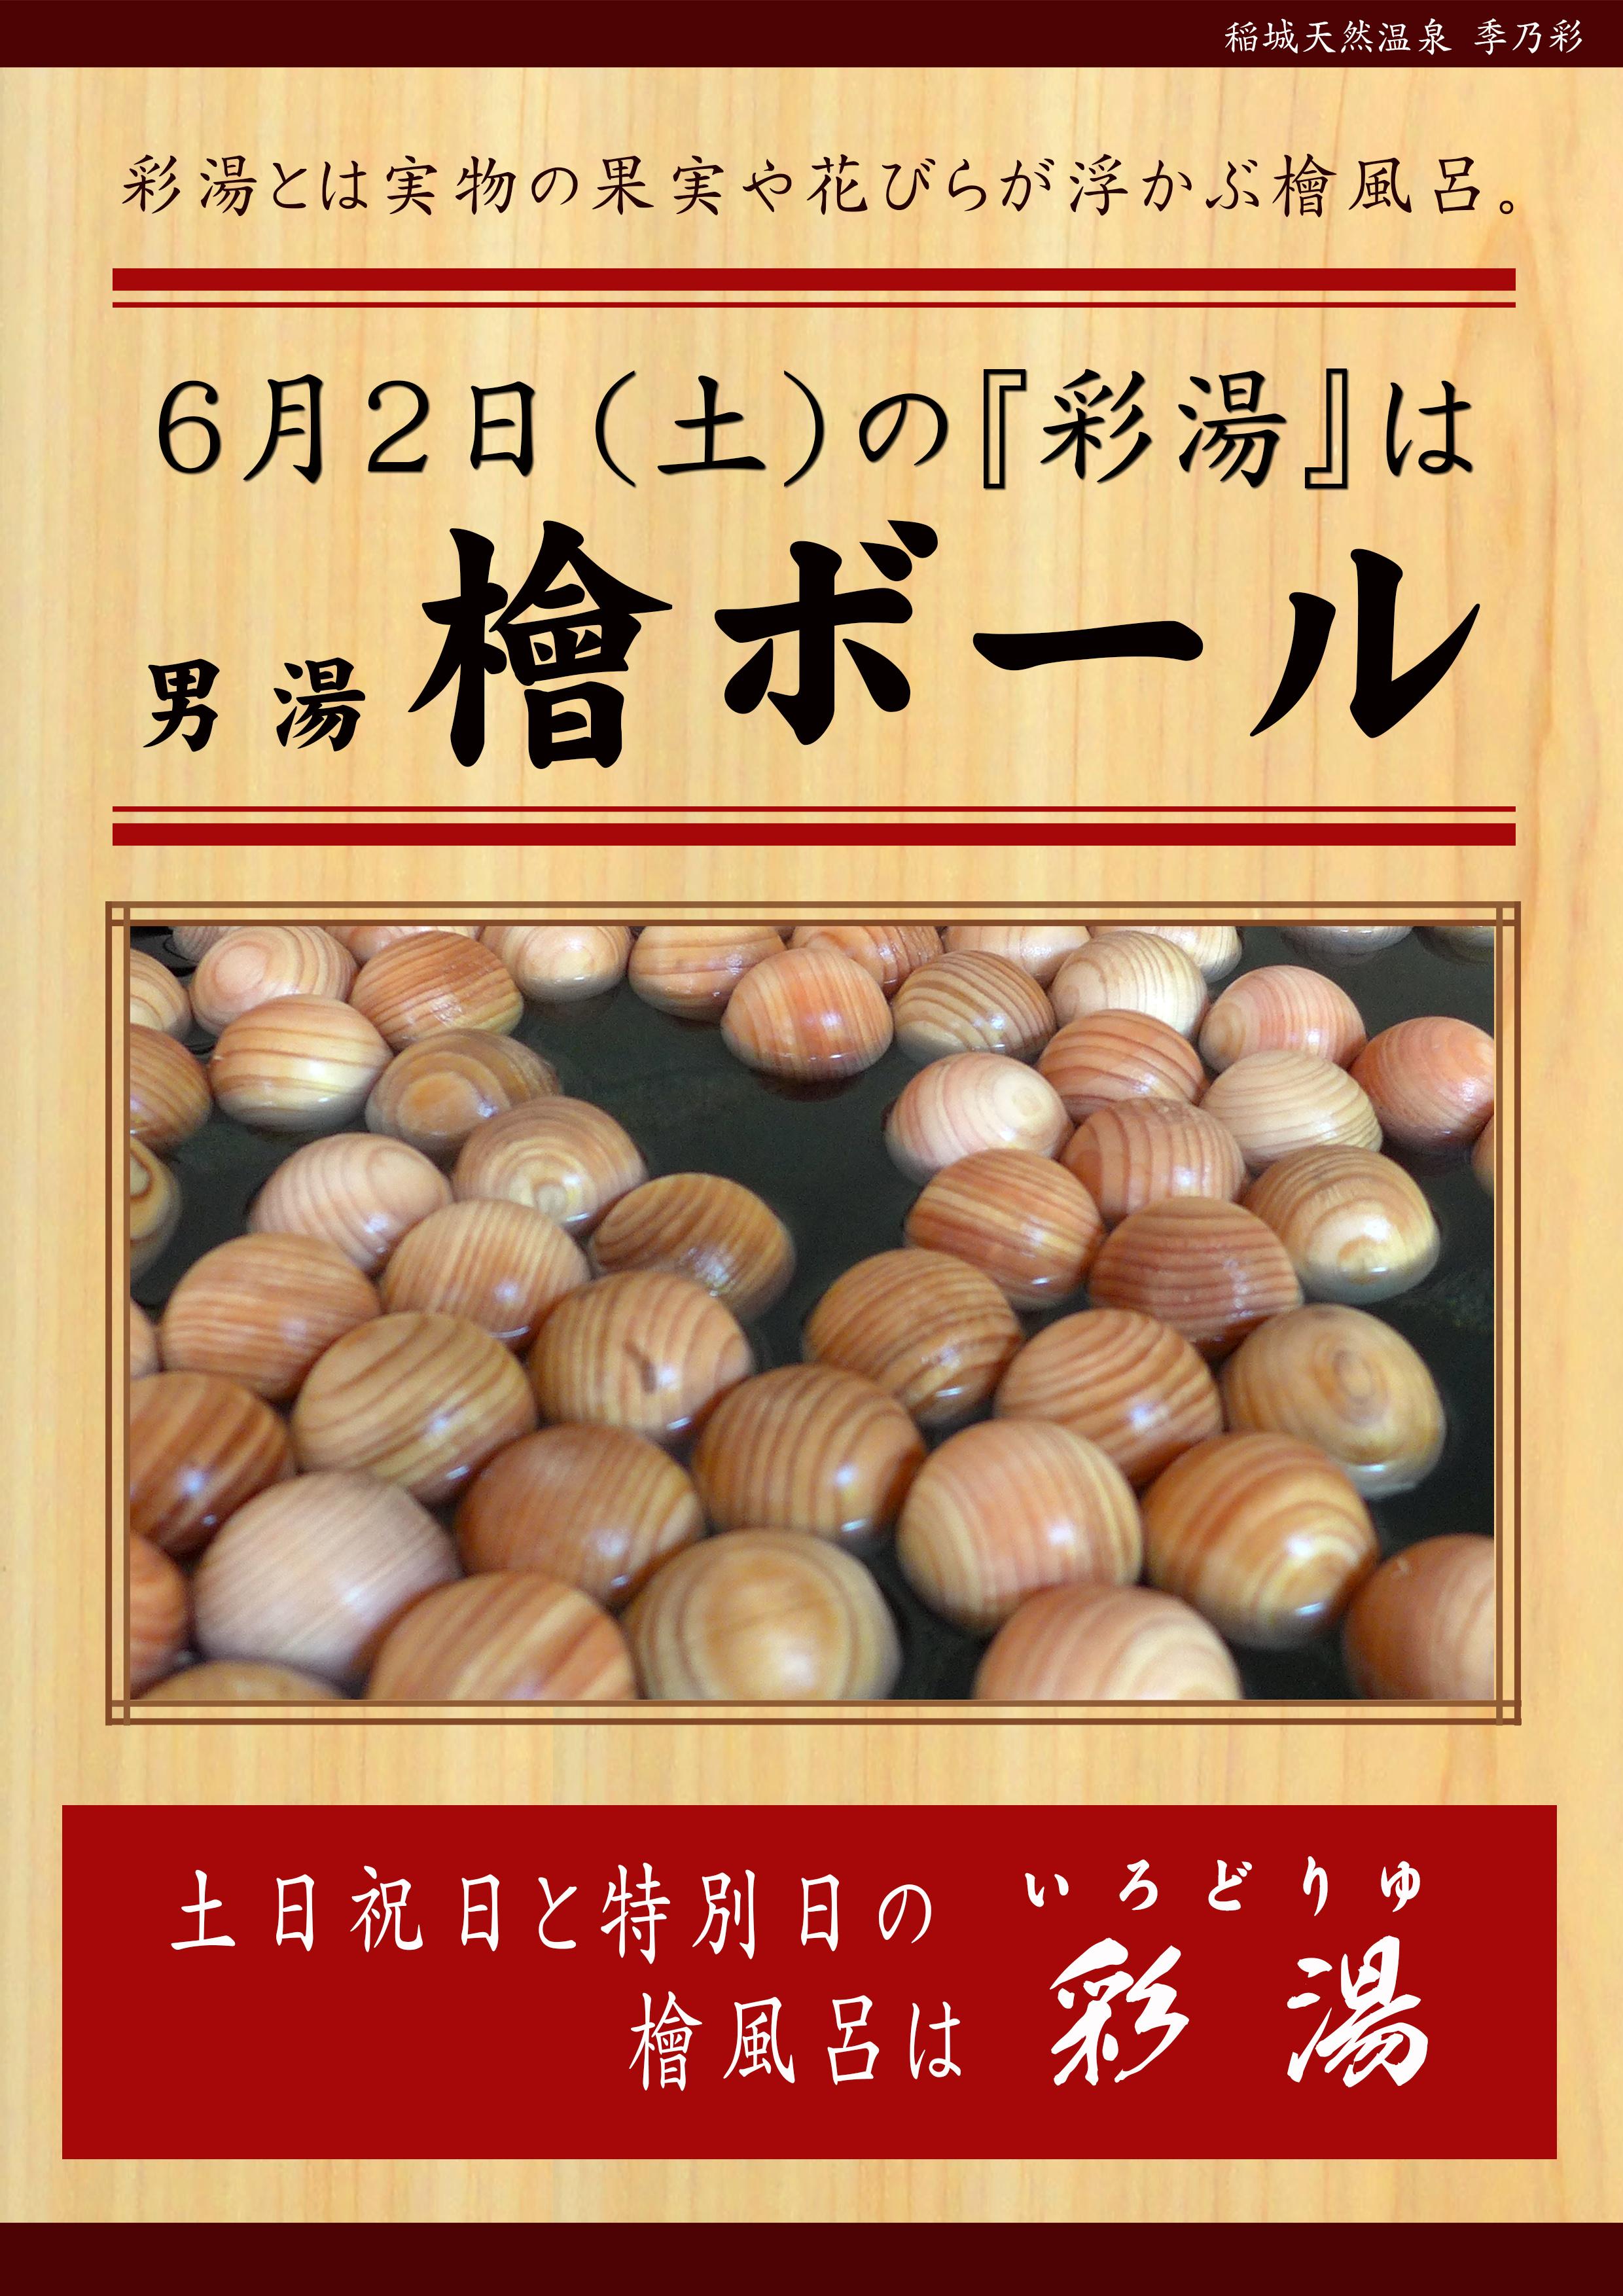 20180602POP イベント 彩湯 男湯 檜ボール